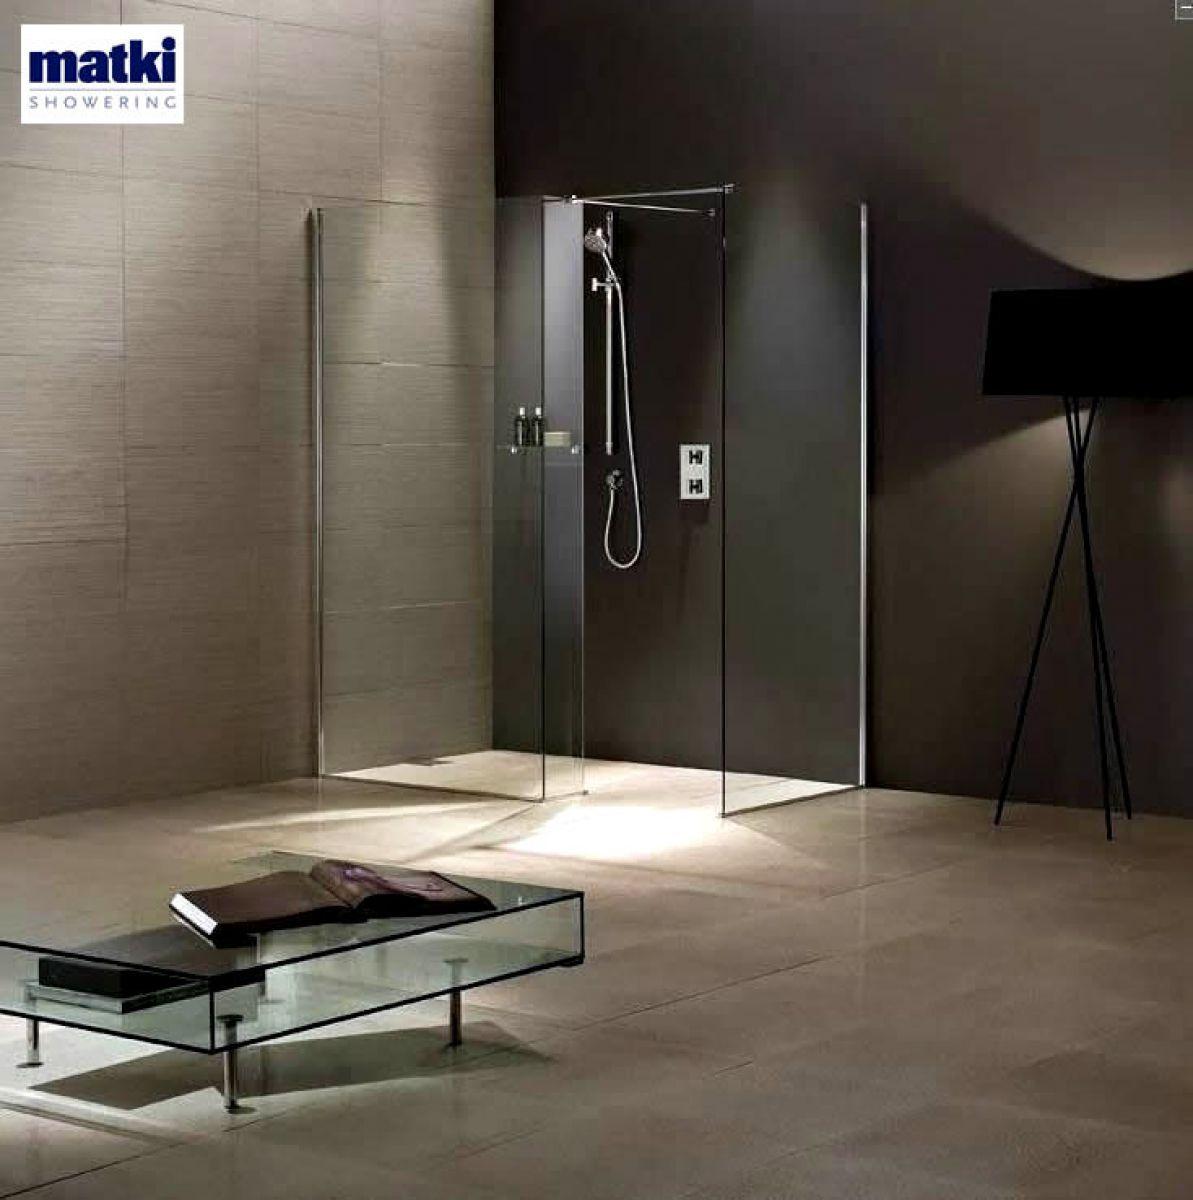 ... Matki Wet Room Walk In Shower Panel ... Part 82